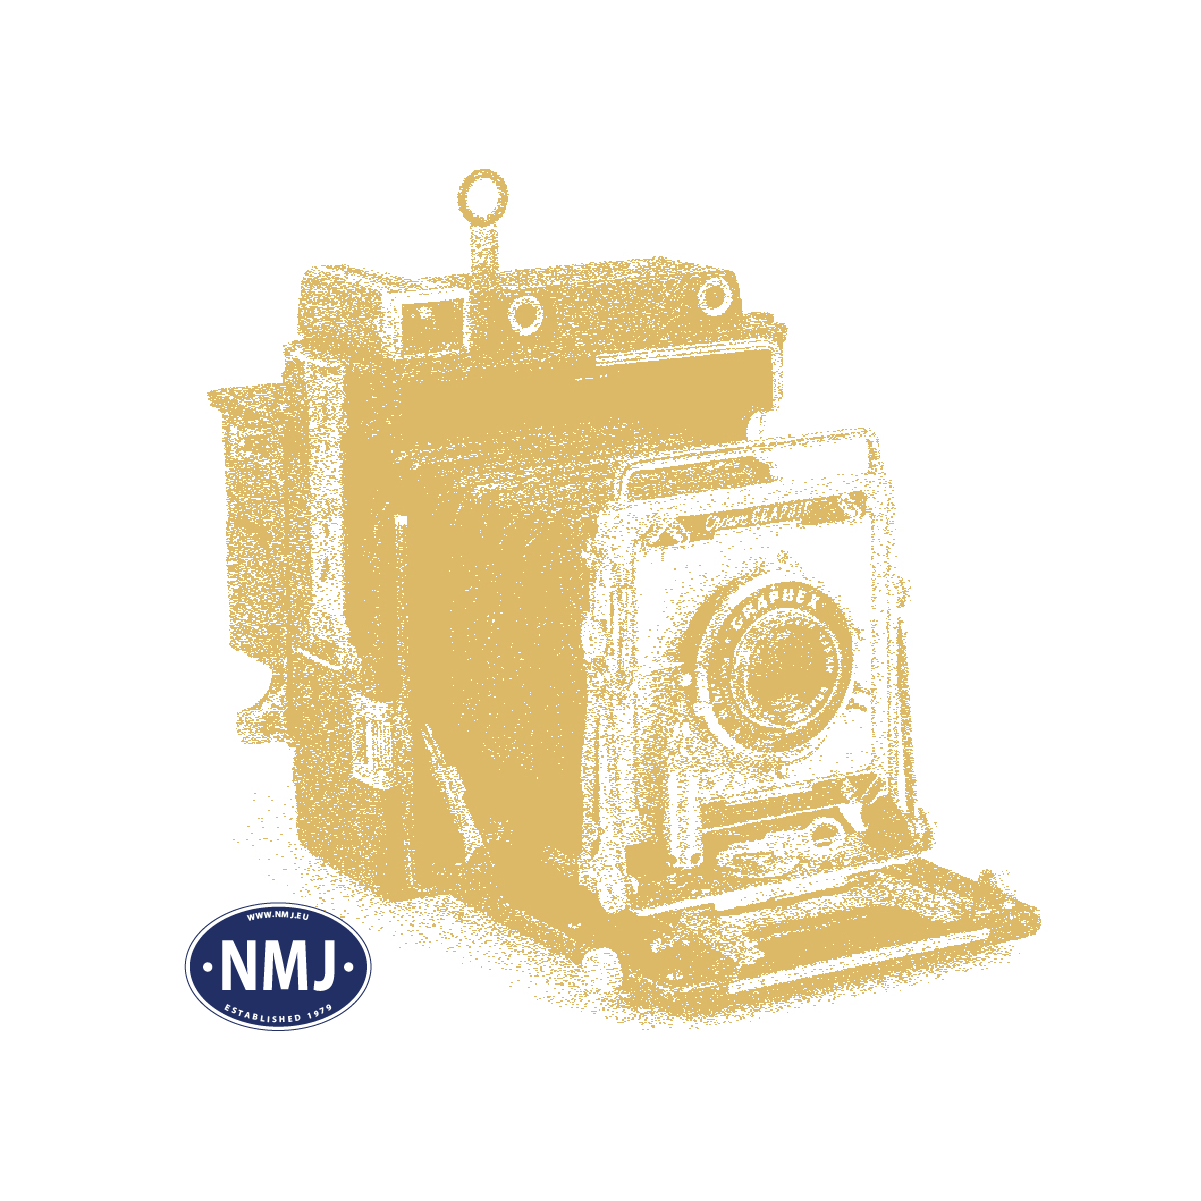 NMJT101.303 - NMJ Topline NSB WLABK 21079 Nydesign